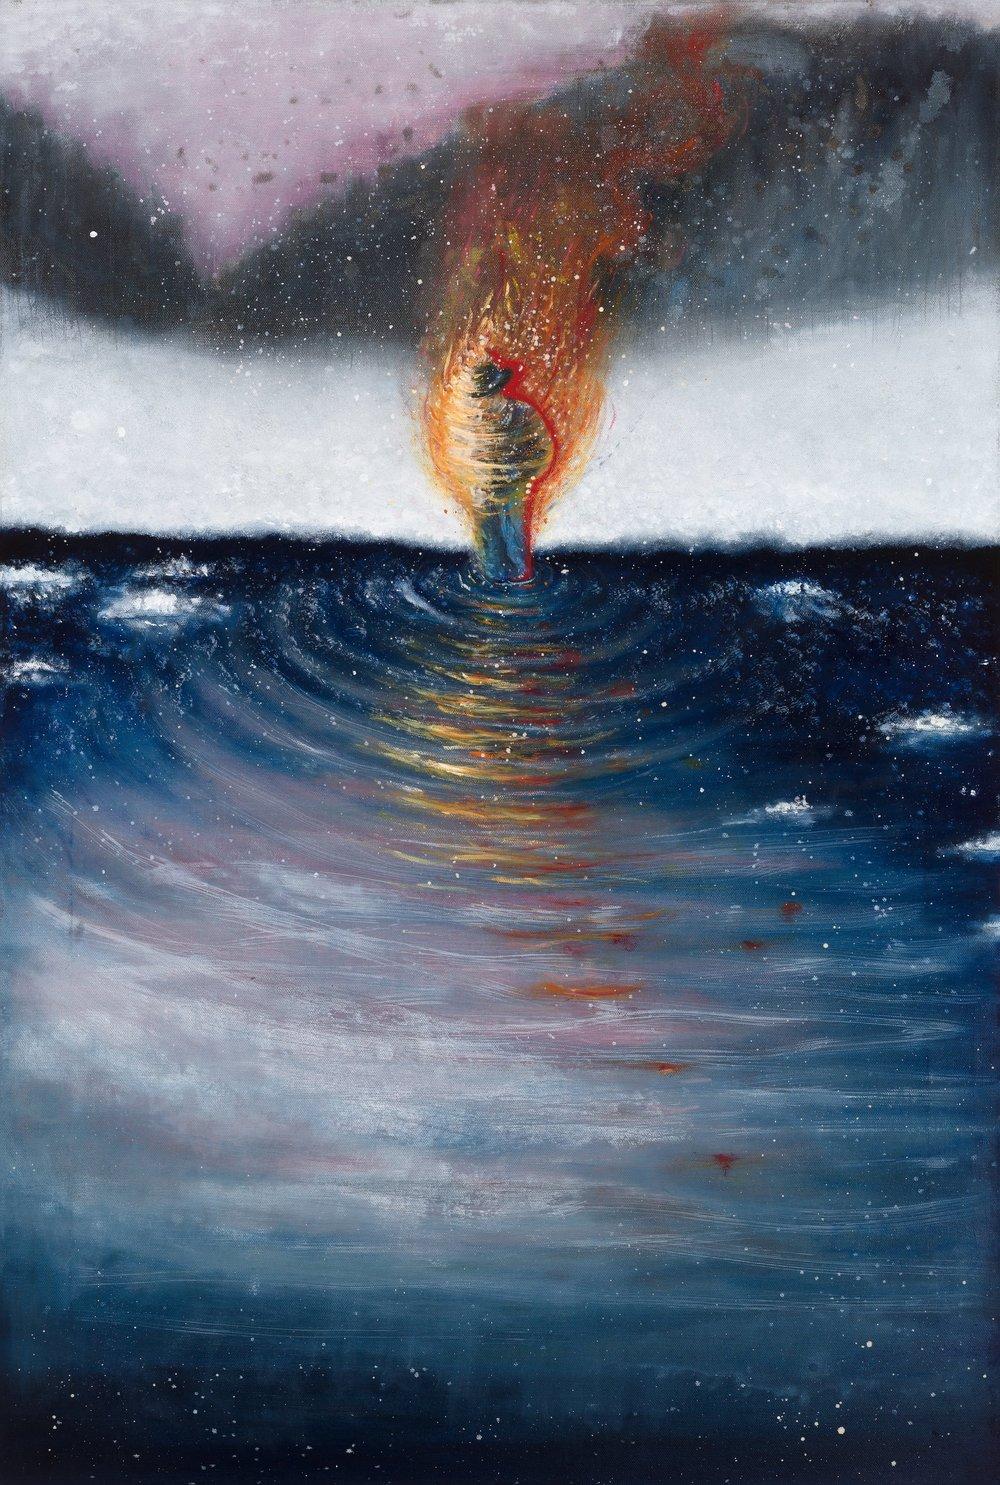 Max Boyla, Man on Fire, painting.jpg